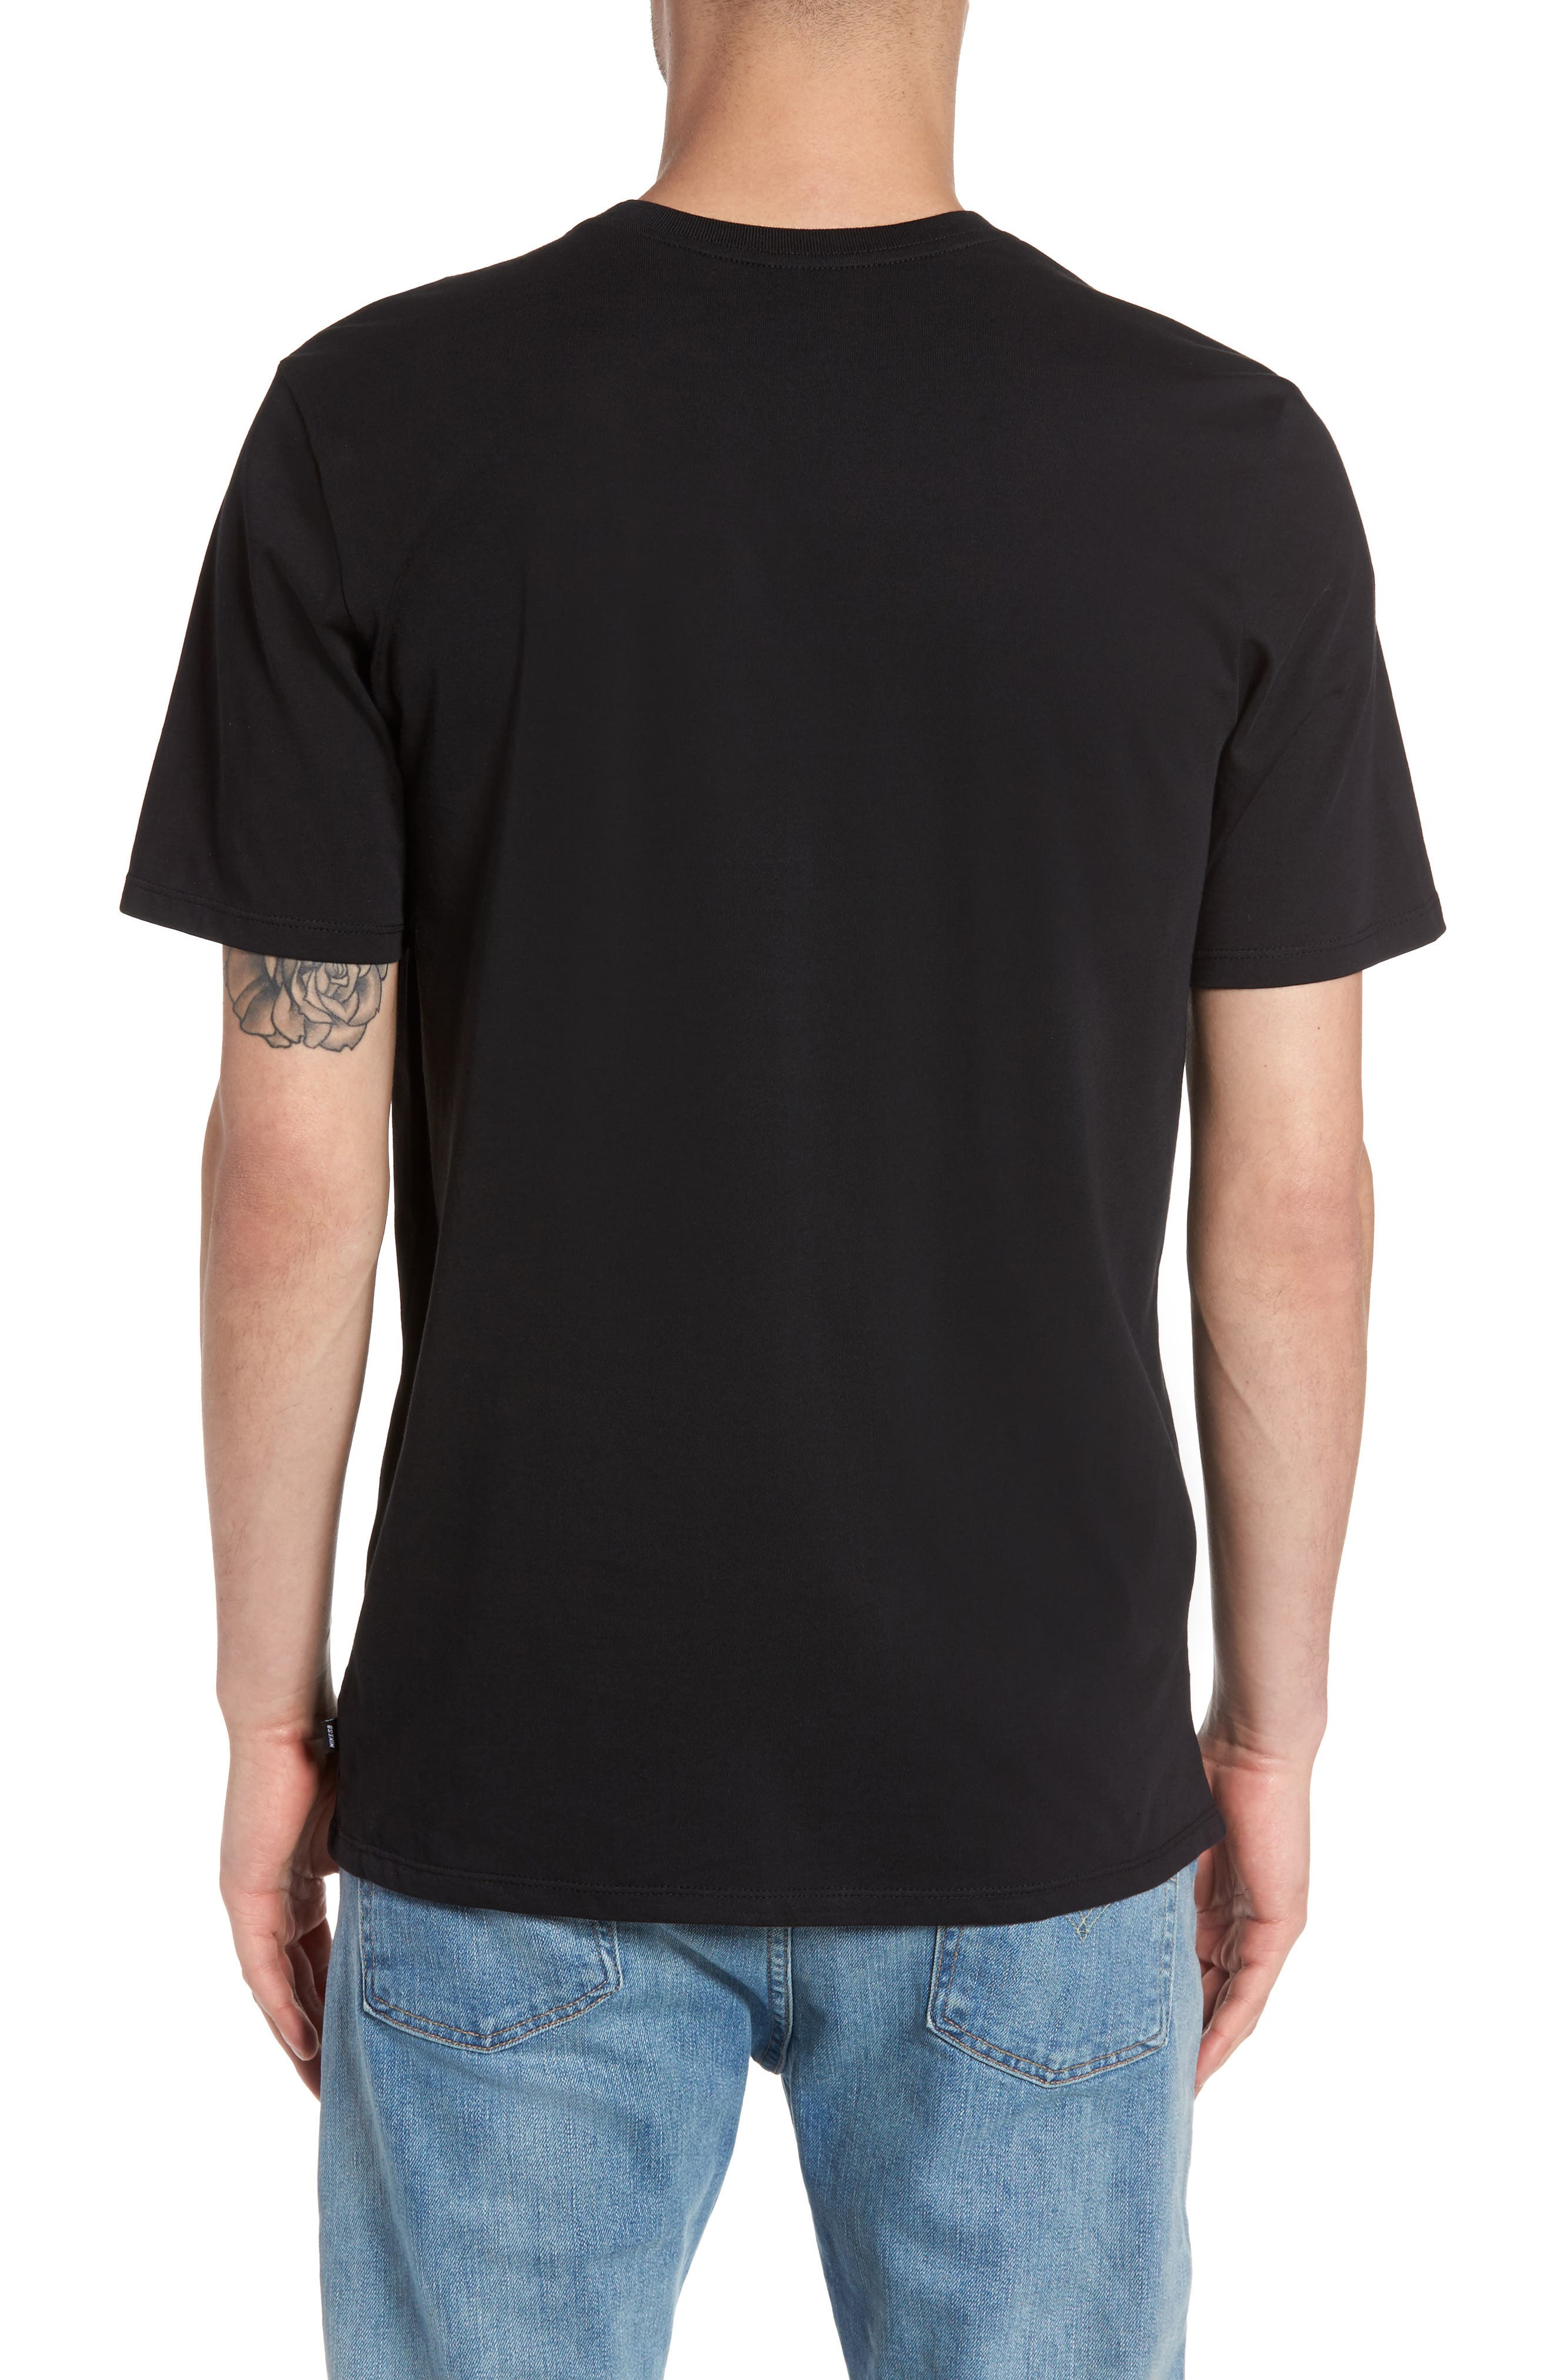 Penguin T-Shirt,                             Alternate thumbnail 2, color,                             010